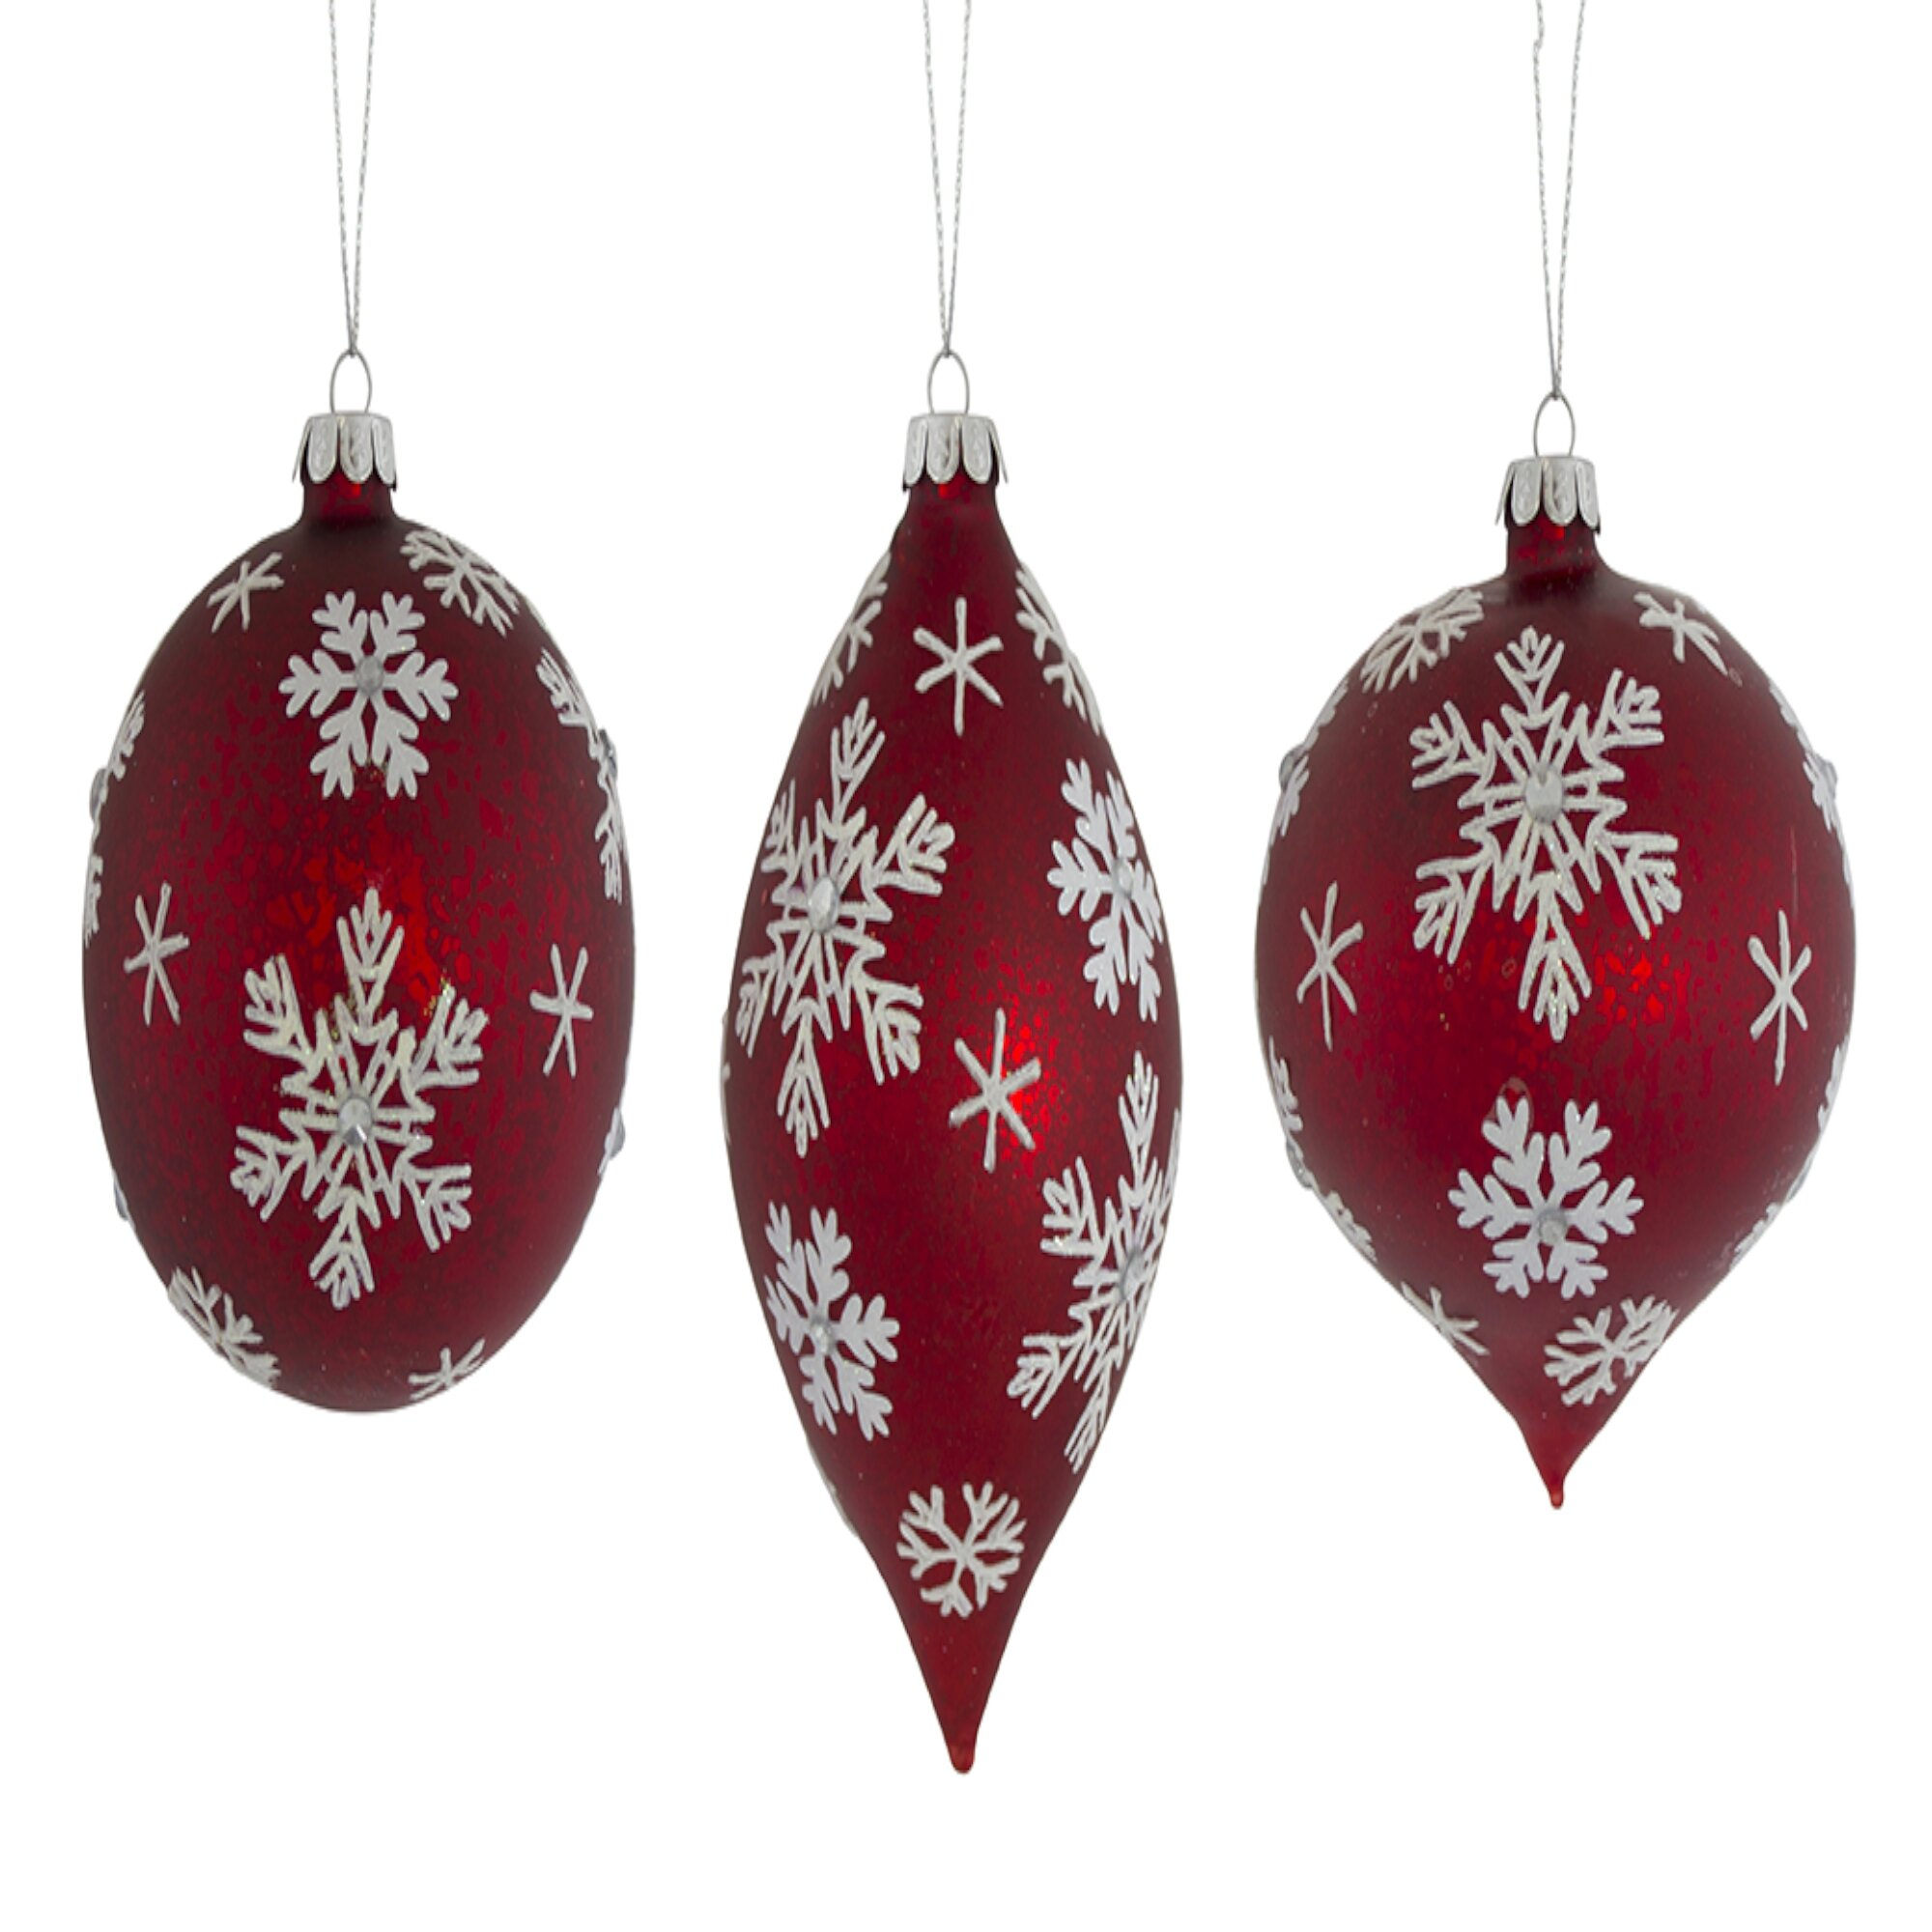 The Holiday Aisle 6 Piece Snowflake Glass Finial Ornament Set Wayfair